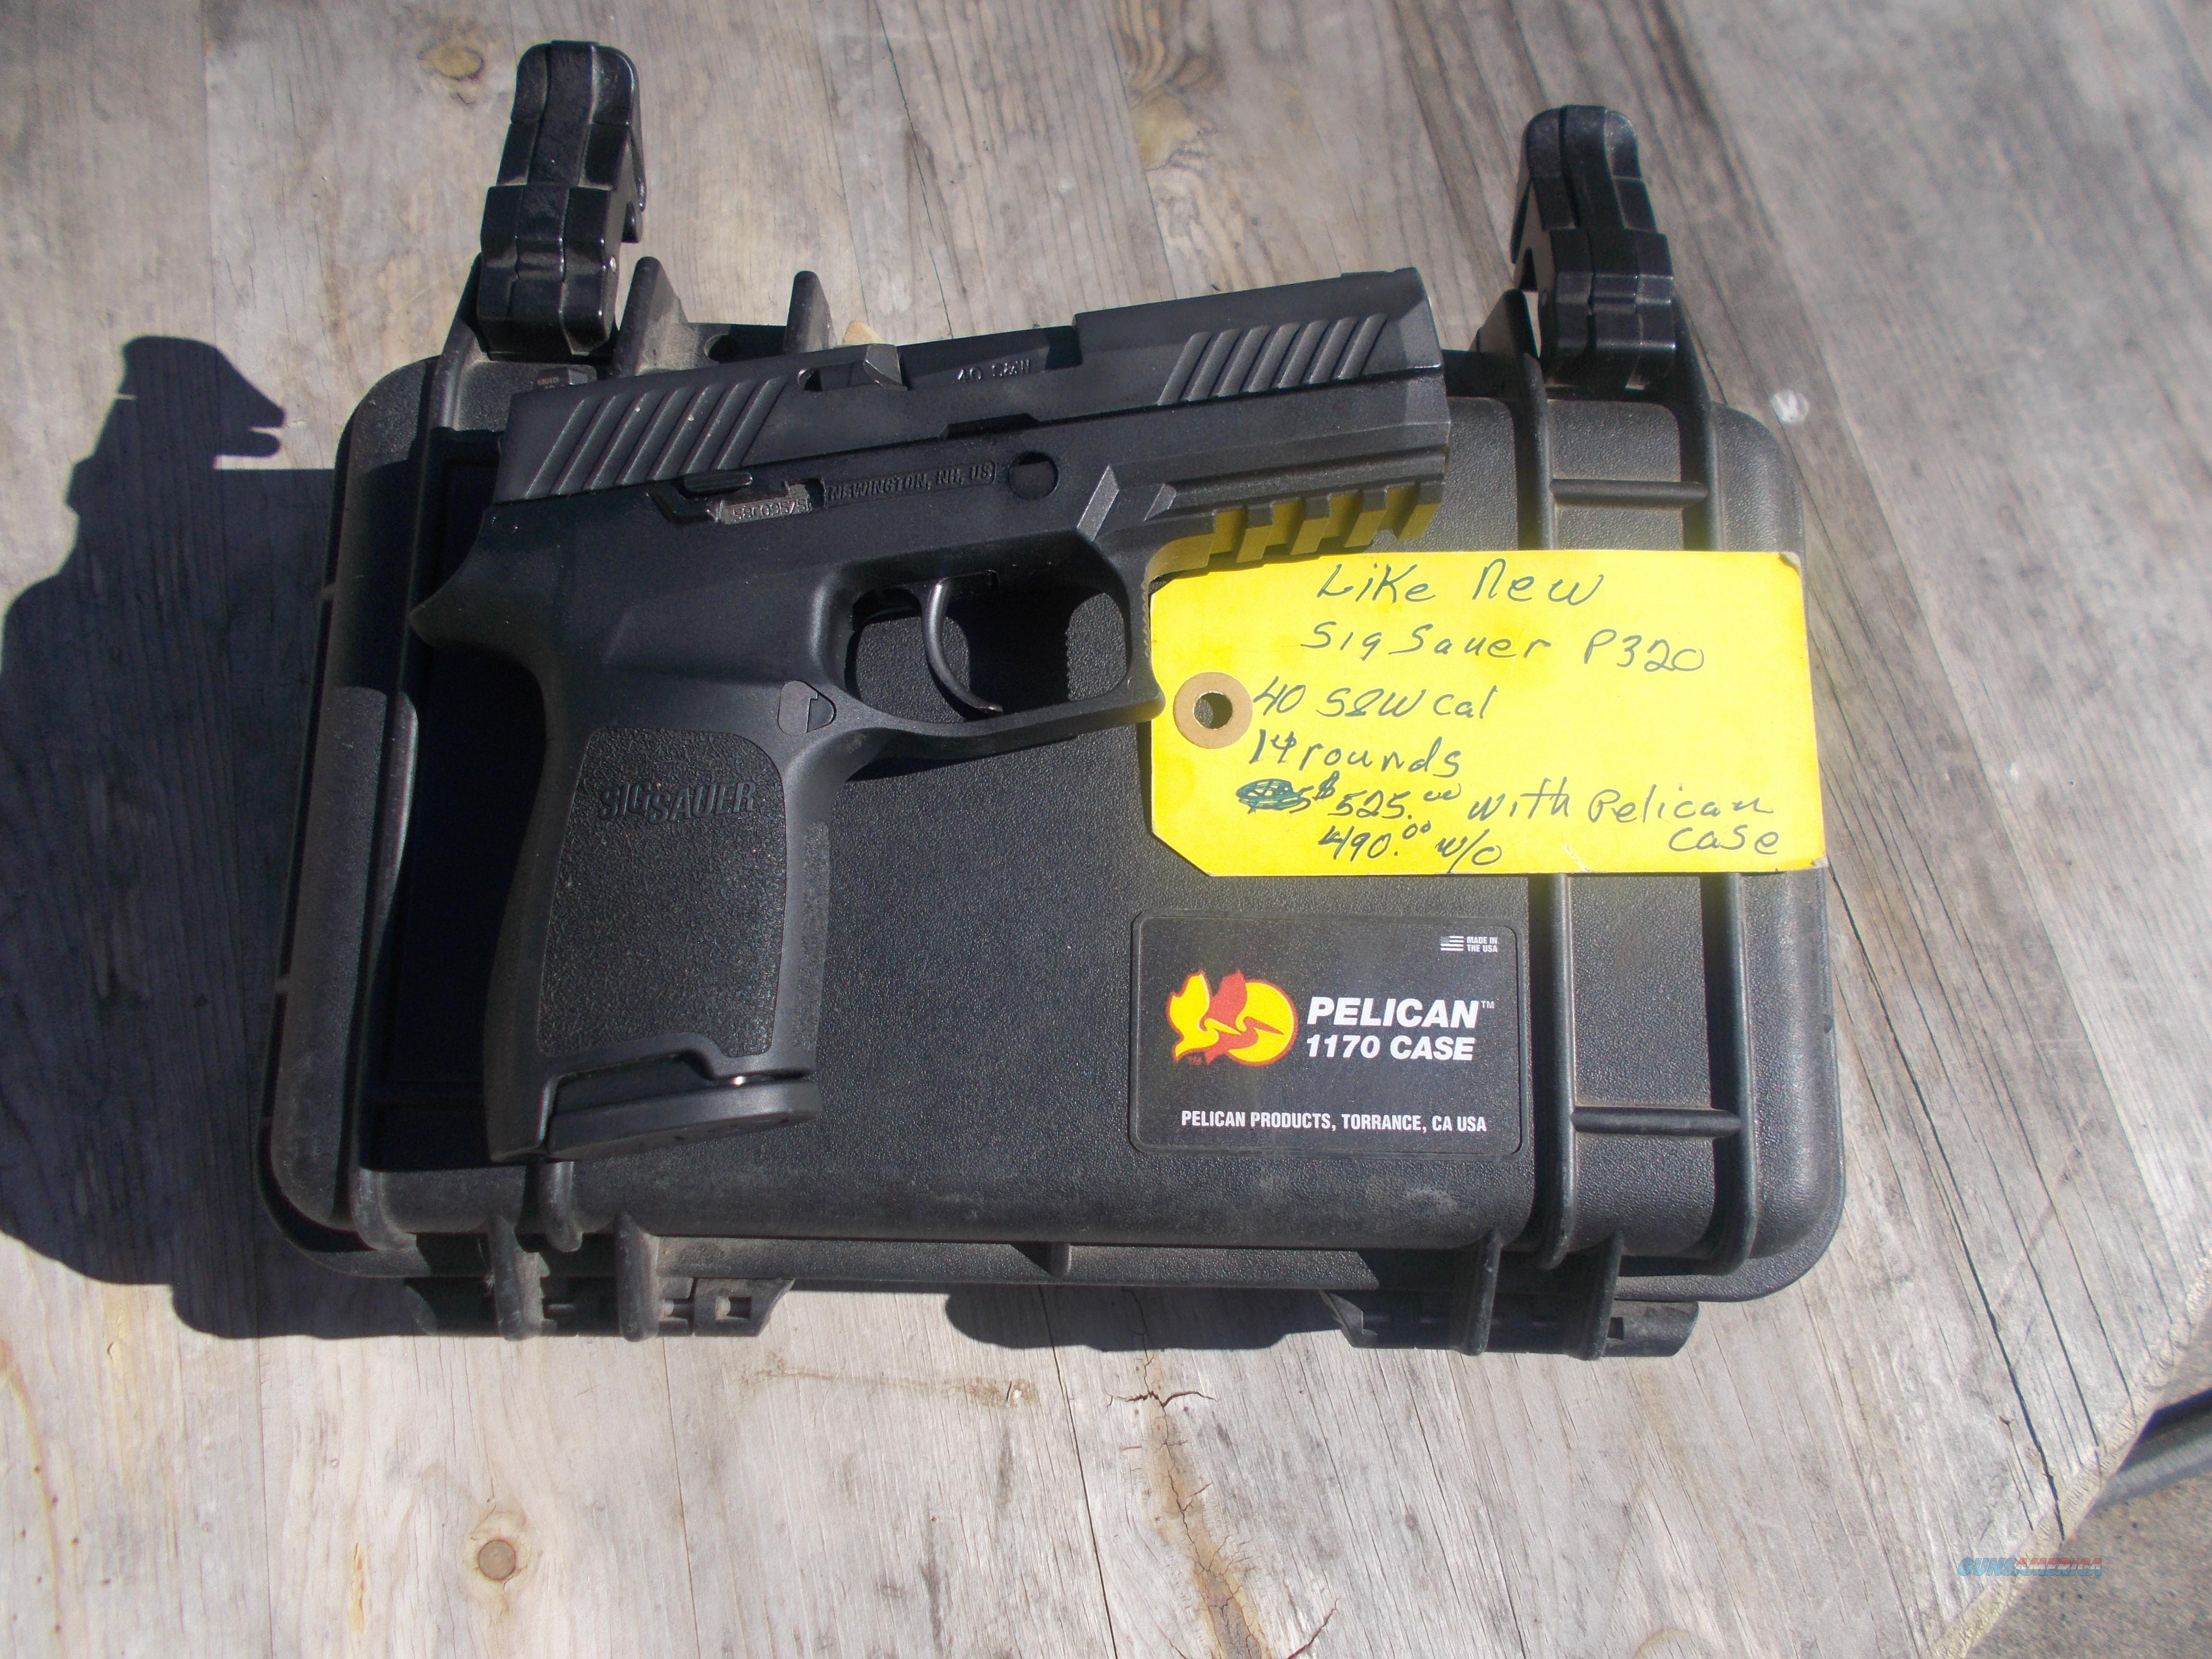 sig sauer p320 40SW cal  Guns > Pistols > Sig - Sauer/Sigarms Pistols > P320